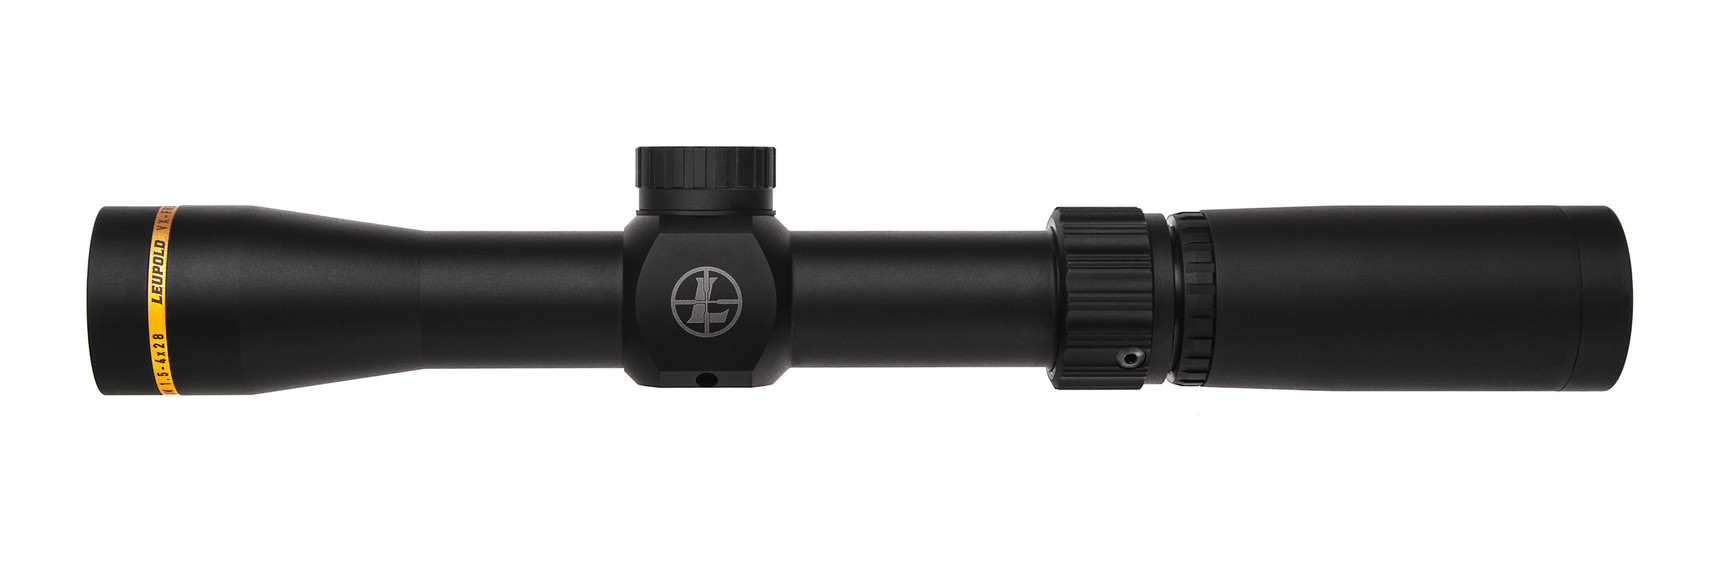 Прицел оптический Leupold VX-Freedom 1.5-4x28 (1 inch) IER Scout Duplex